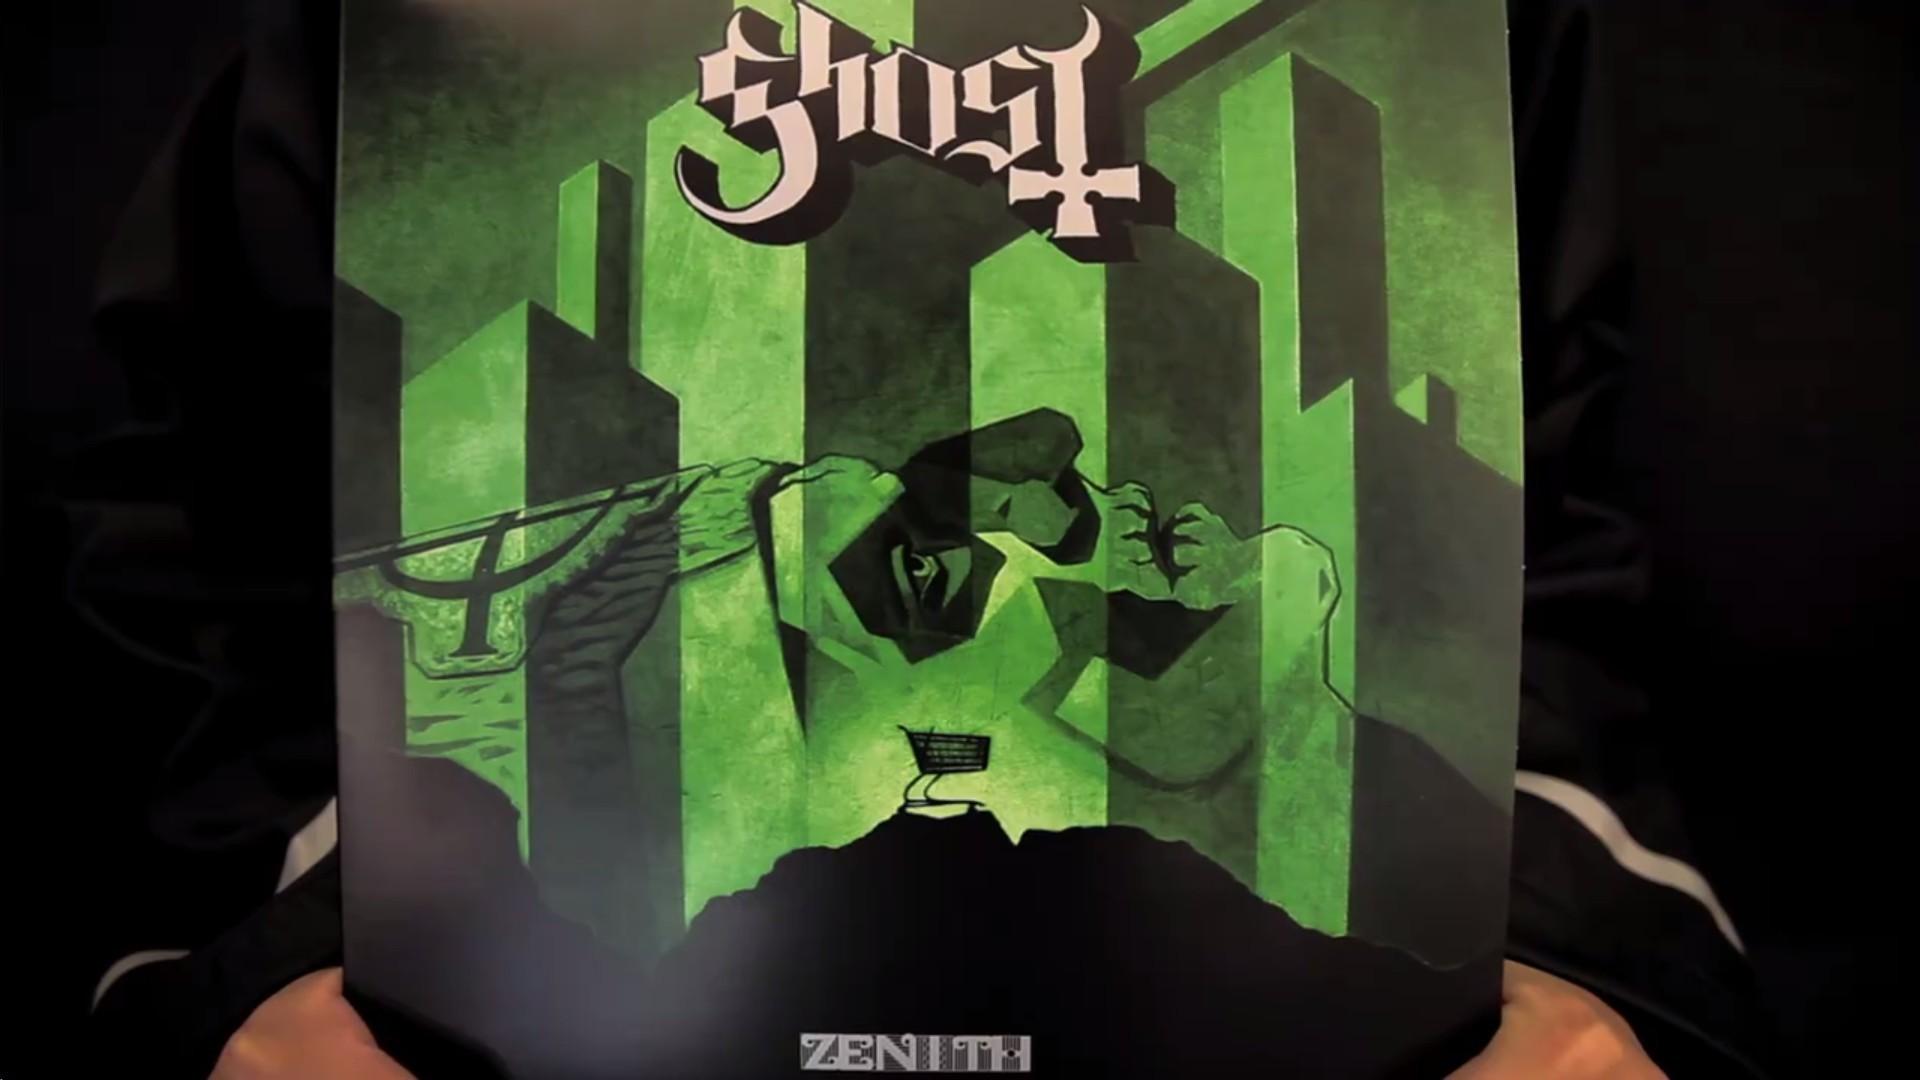 Res: 1920x1080, Stream Ghost's 'Zenith'